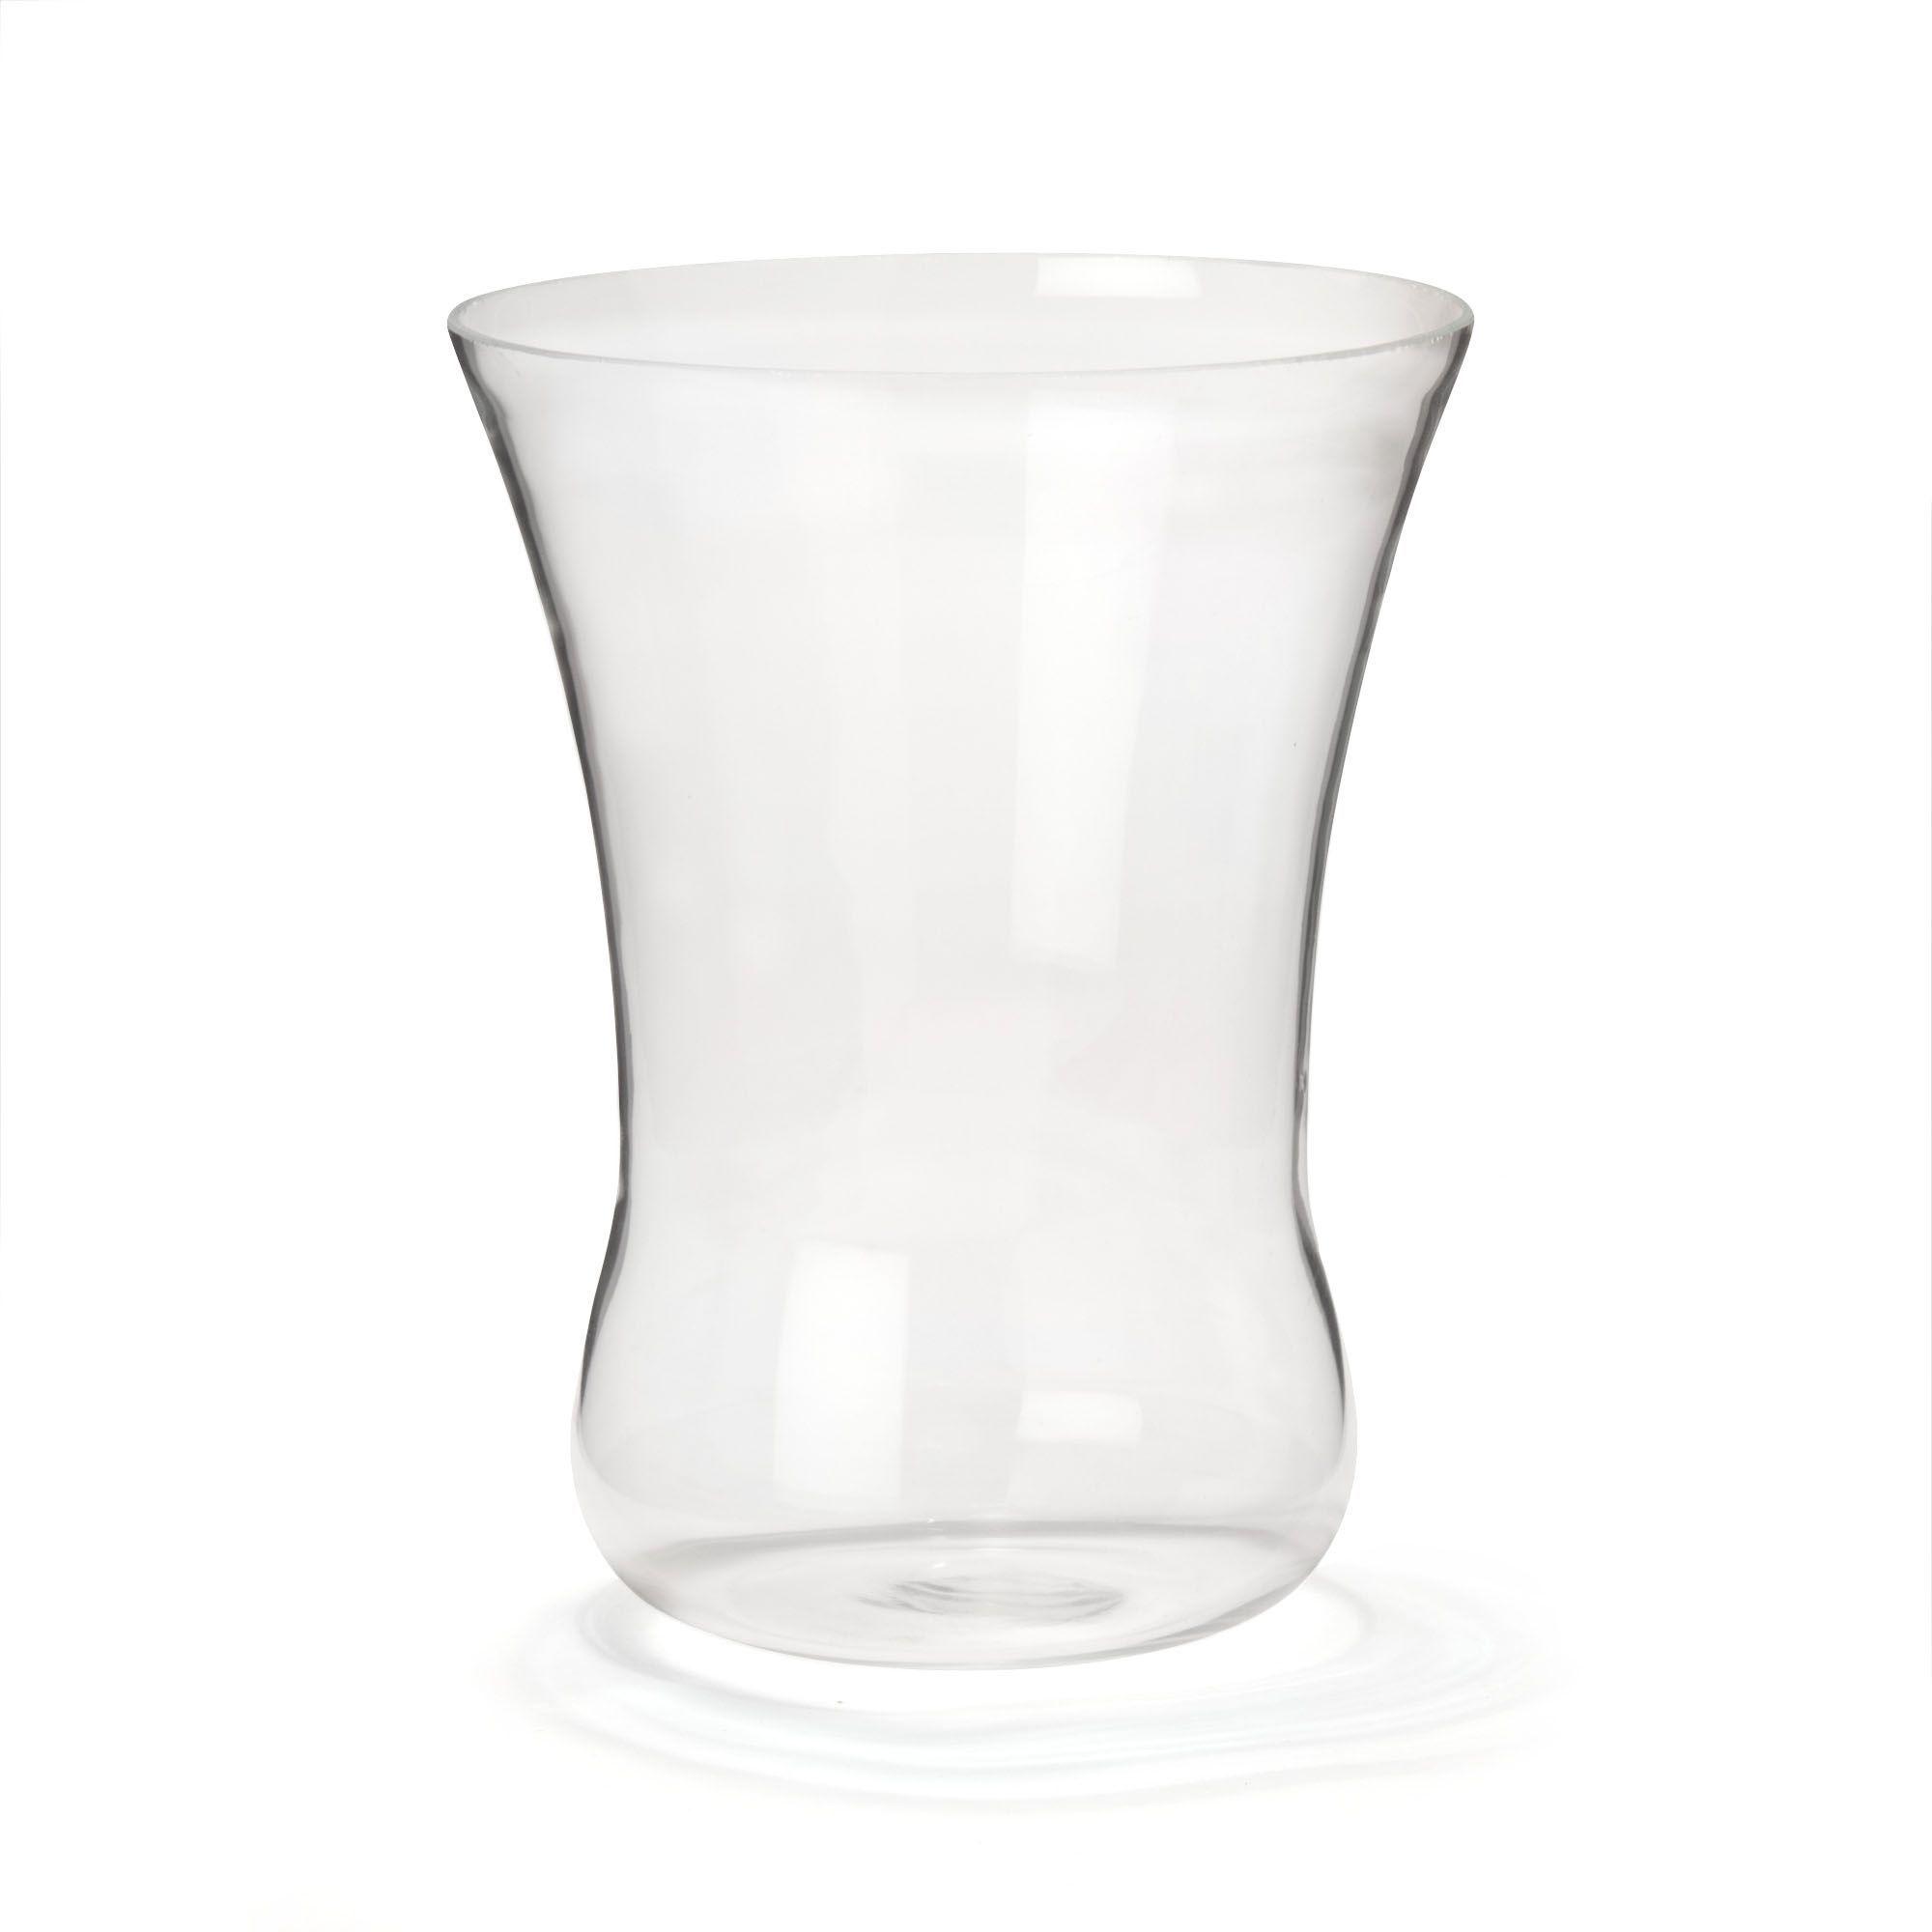 decoration de grand vase transparent perfect idee deco avec grand vase decoration de mariage. Black Bedroom Furniture Sets. Home Design Ideas